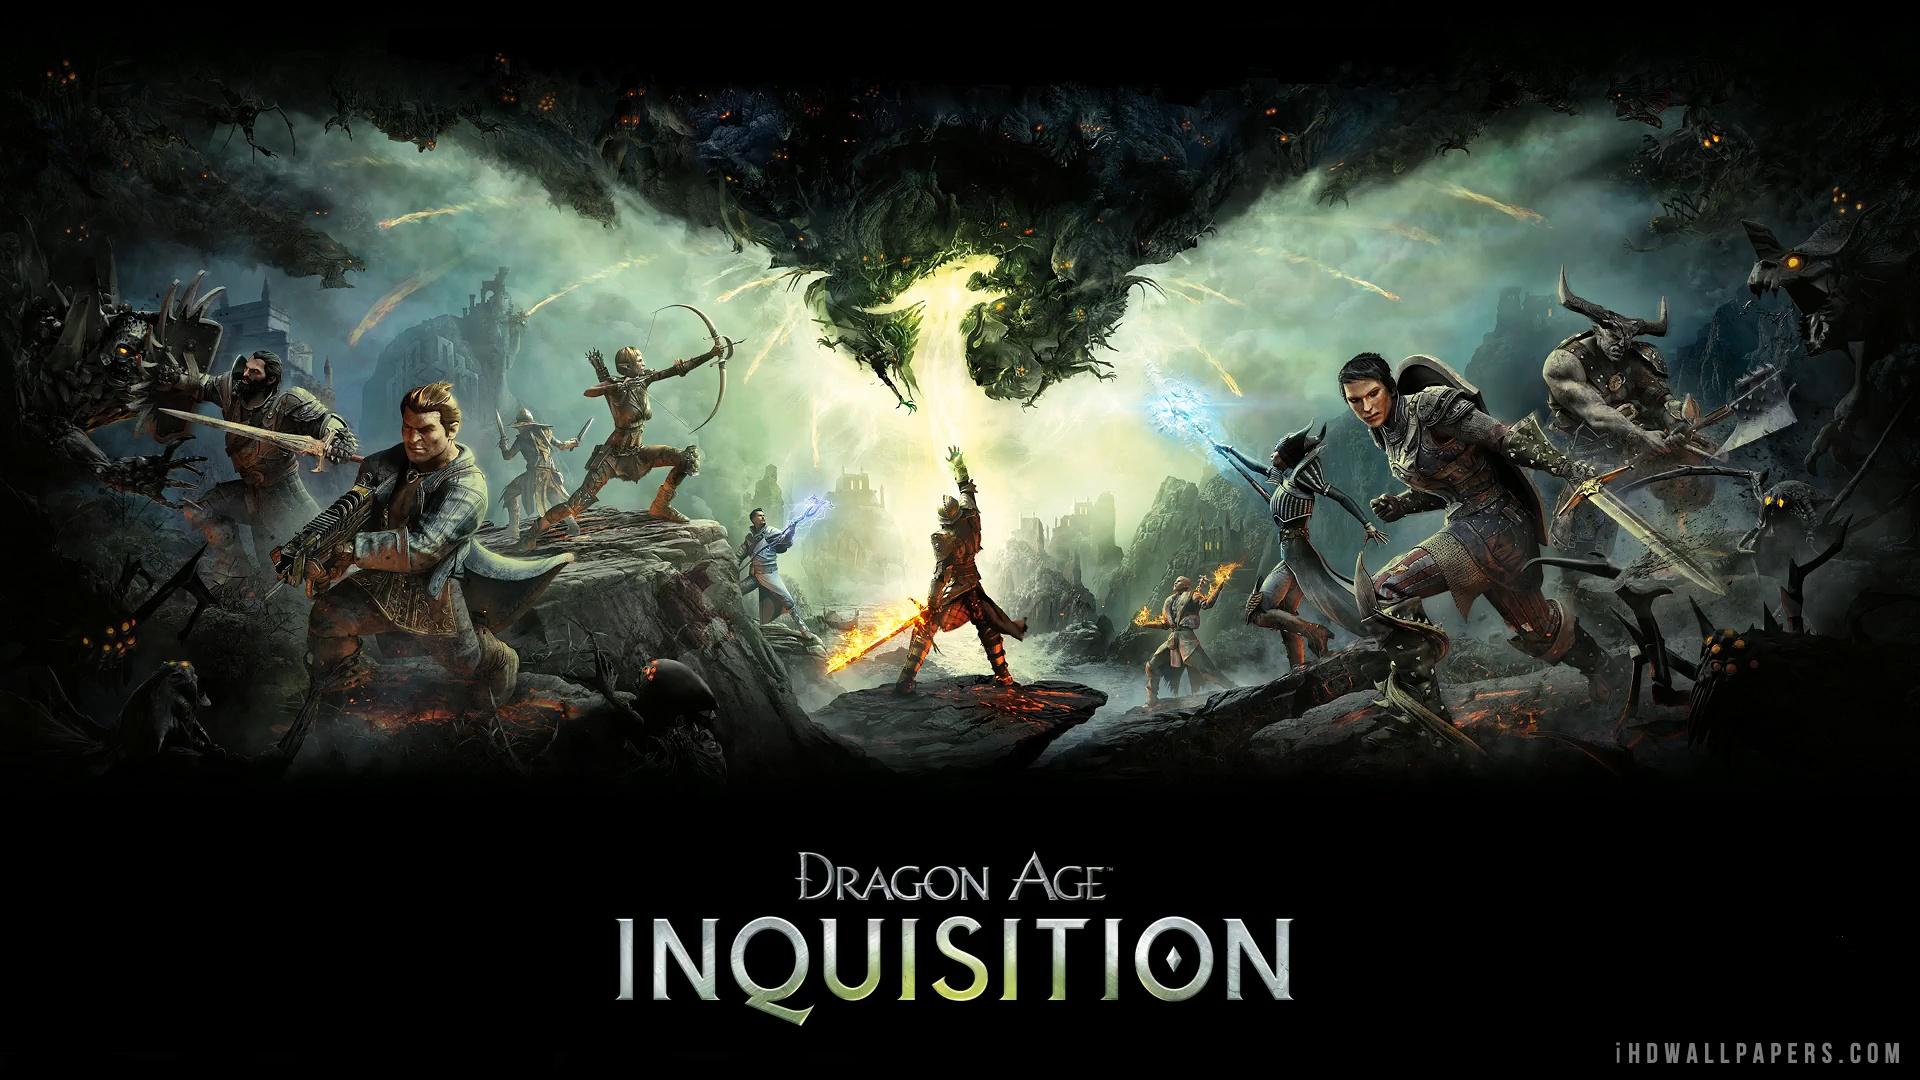 Dragon Age Inquisition wallpaper 1920x1080